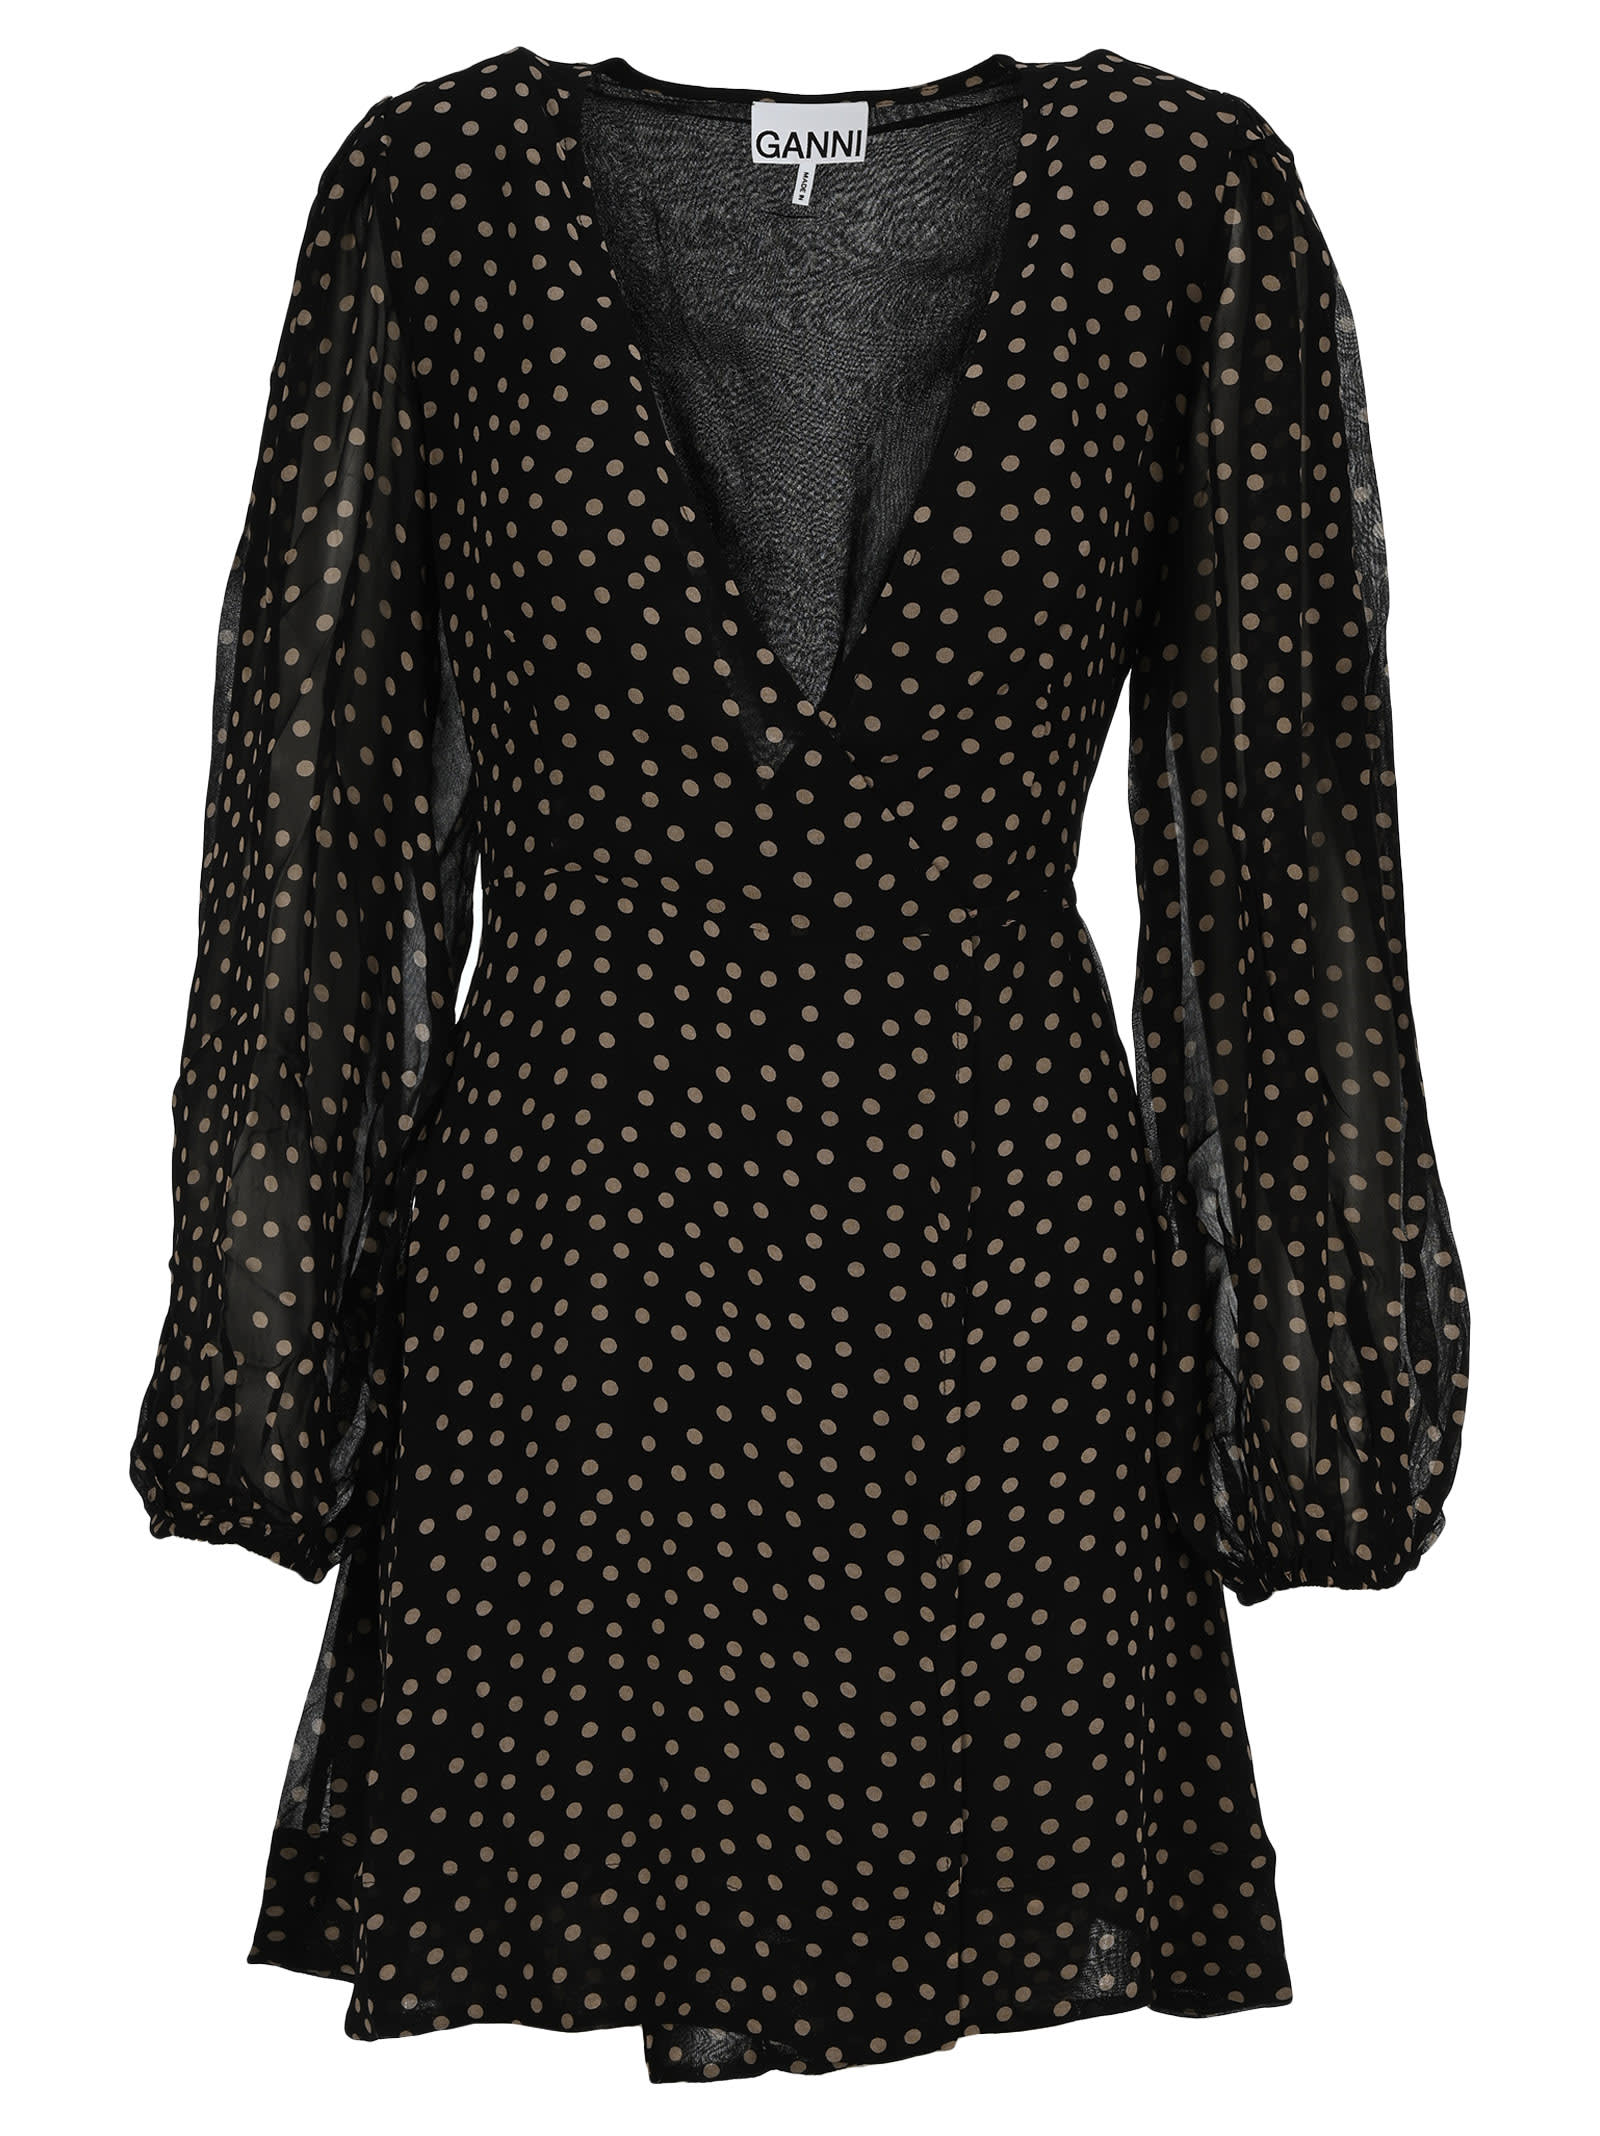 Buy Ganni Printed Georgette Mini Wrap Dress online, shop Ganni with free shipping